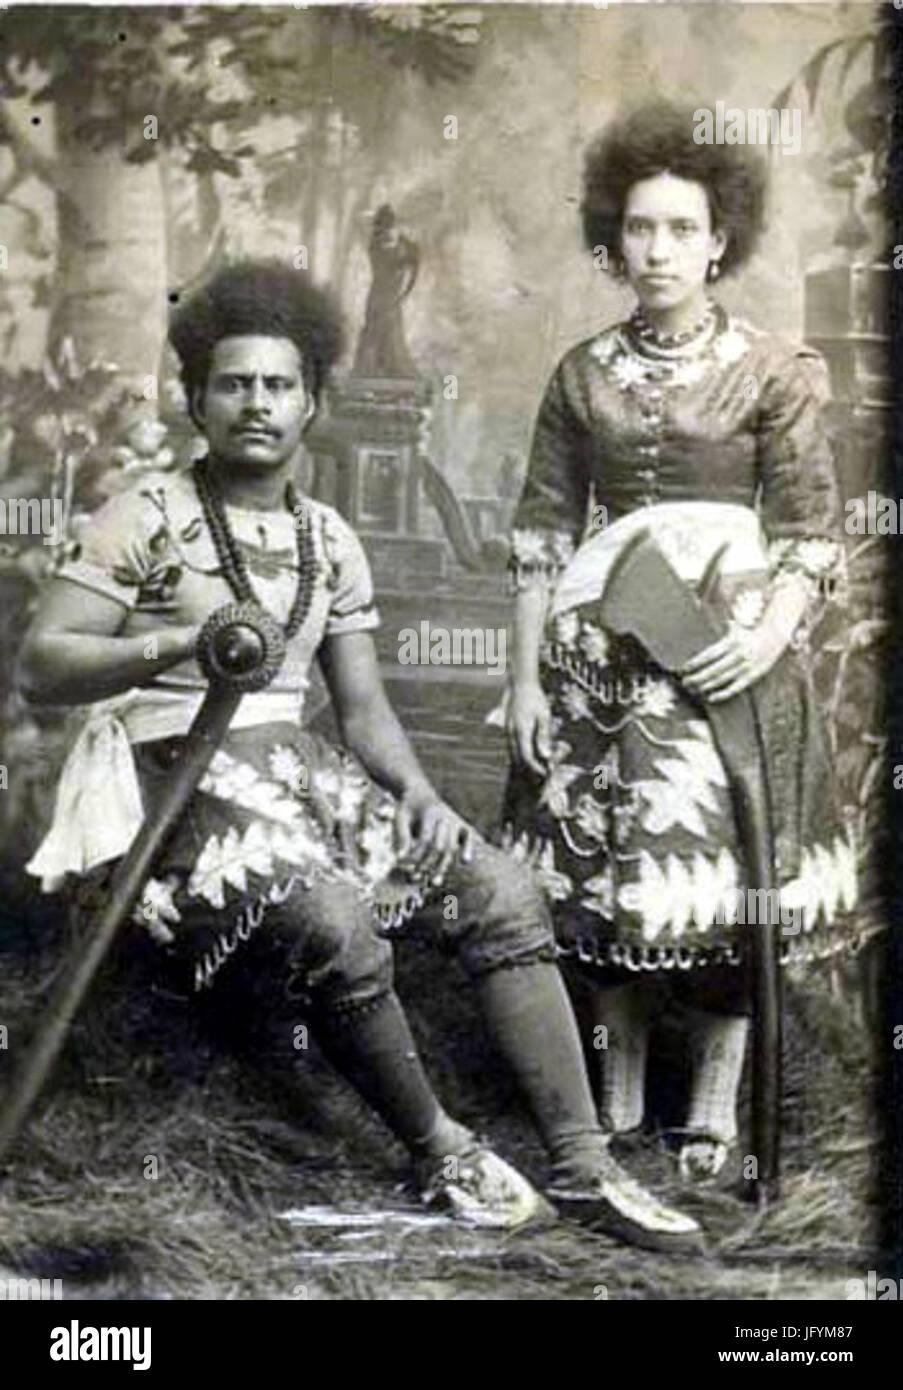 Fijian cannibals in pt barnum s circus united states stock photo fijian cannibals in pt barnum s circus united states stopboris Image collections